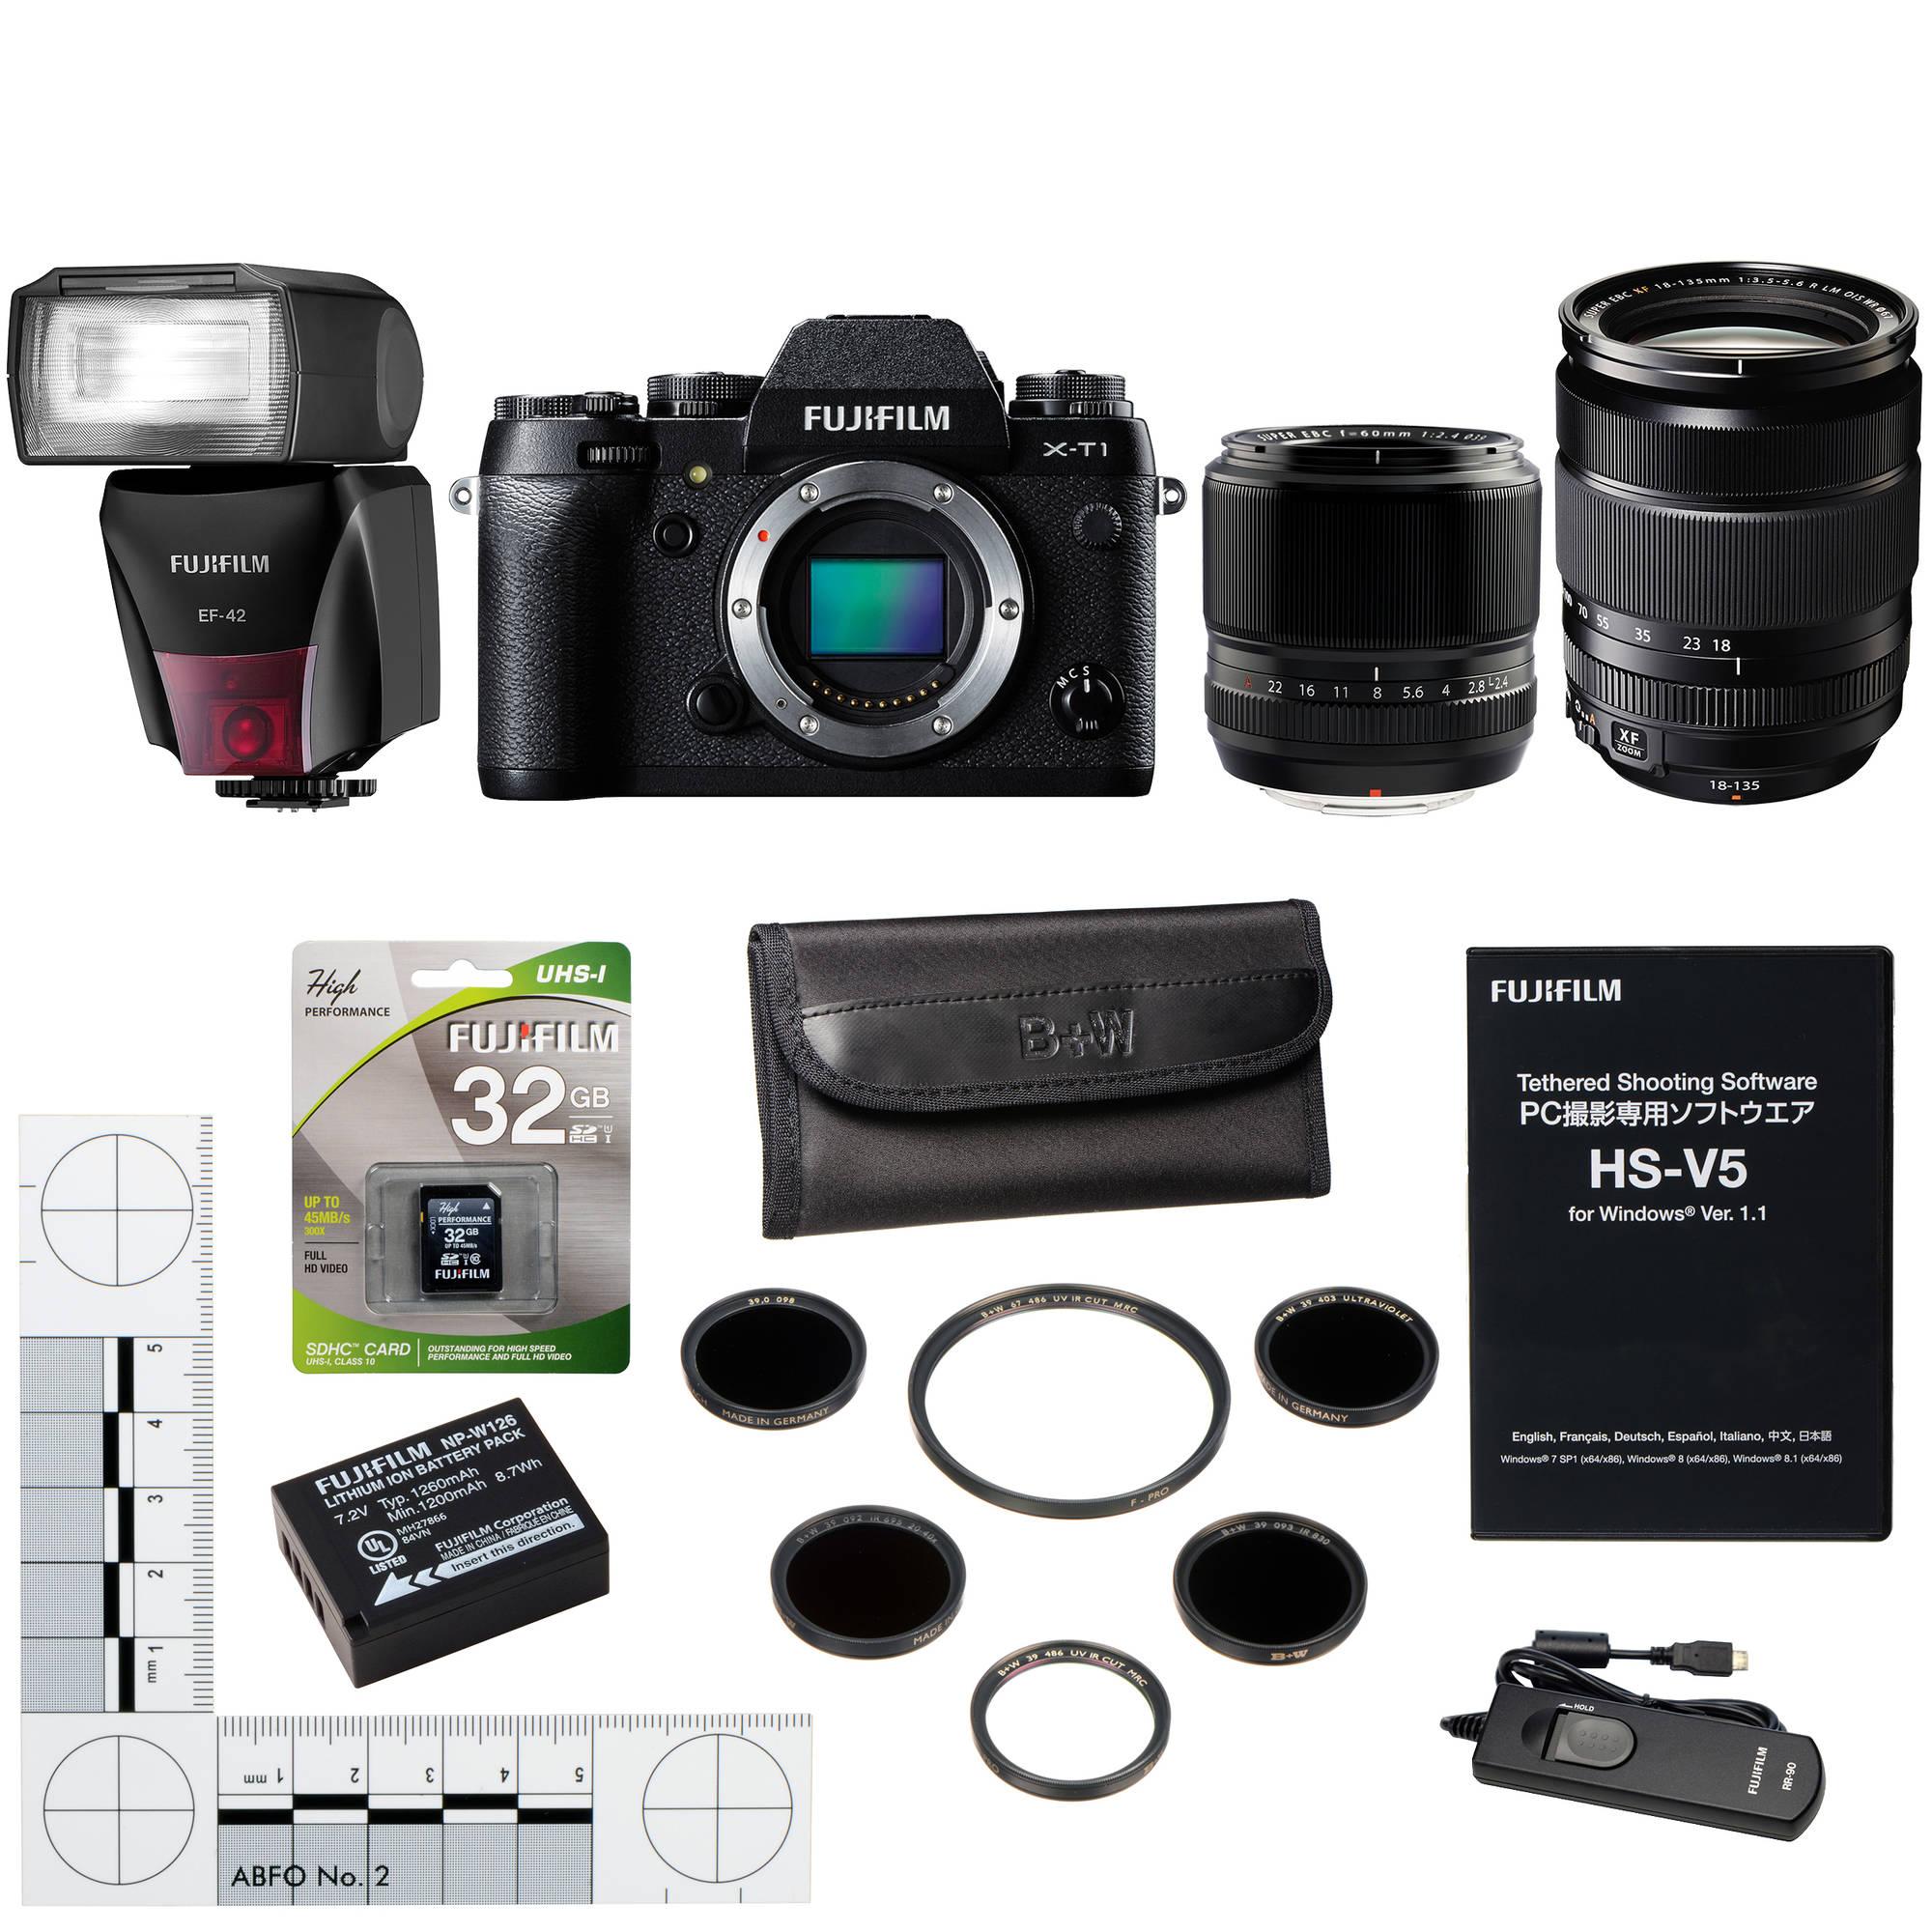 2 Pack SDHC Fujifilm X-A2 Digital Camera Memory Card 2 x 32GB Secure Digital High Capacity Memory Cards